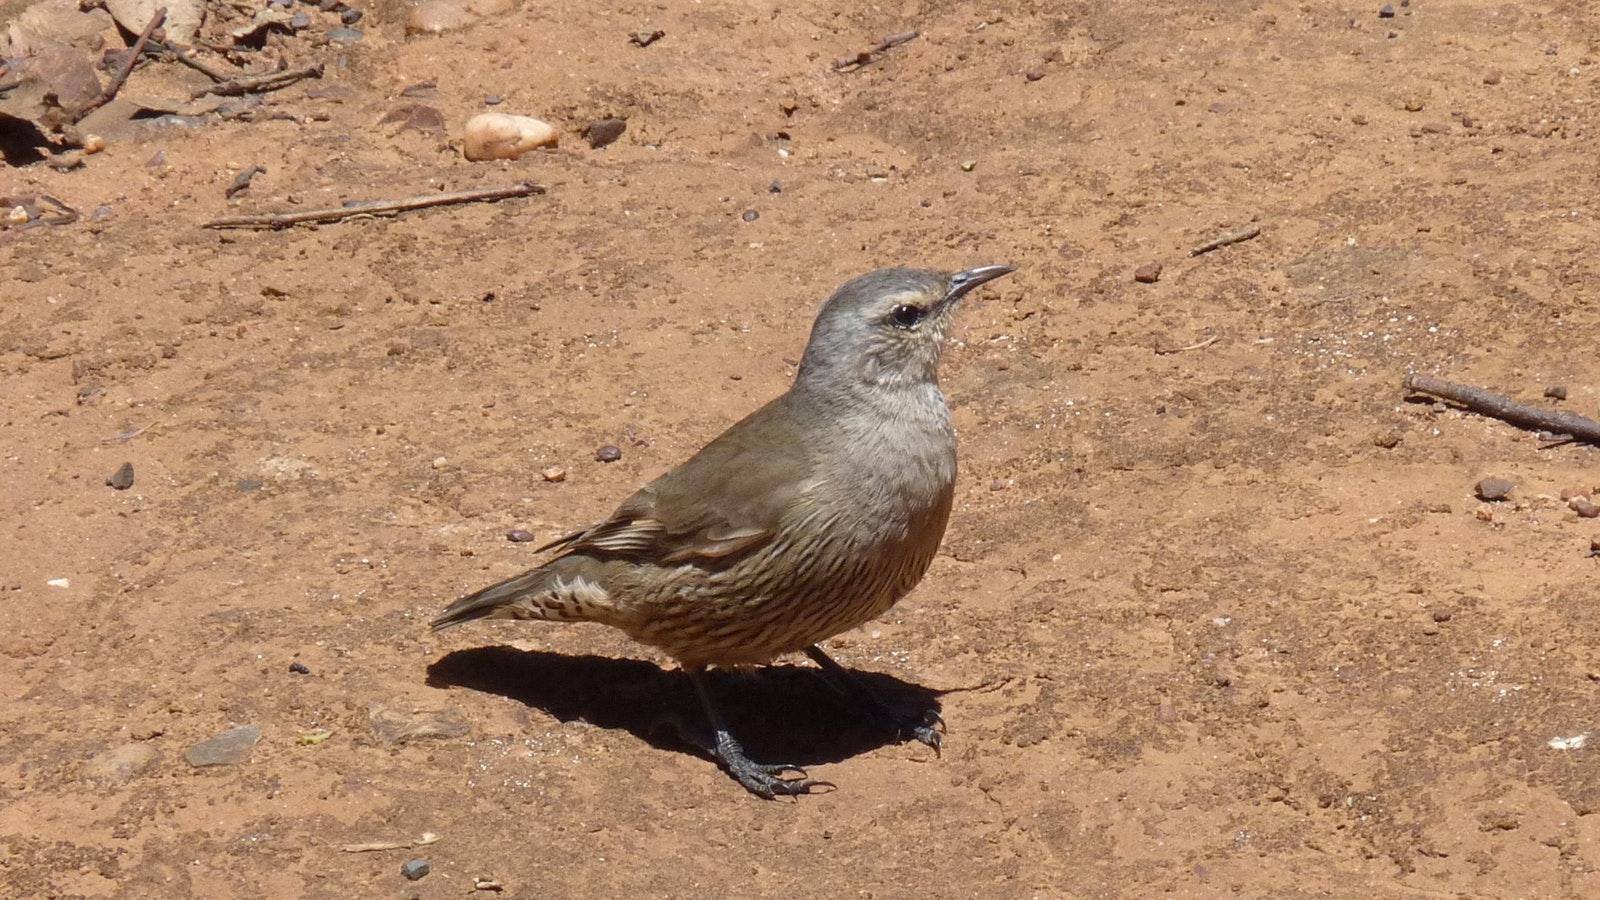 Brown Treecreeper, another woodland bird